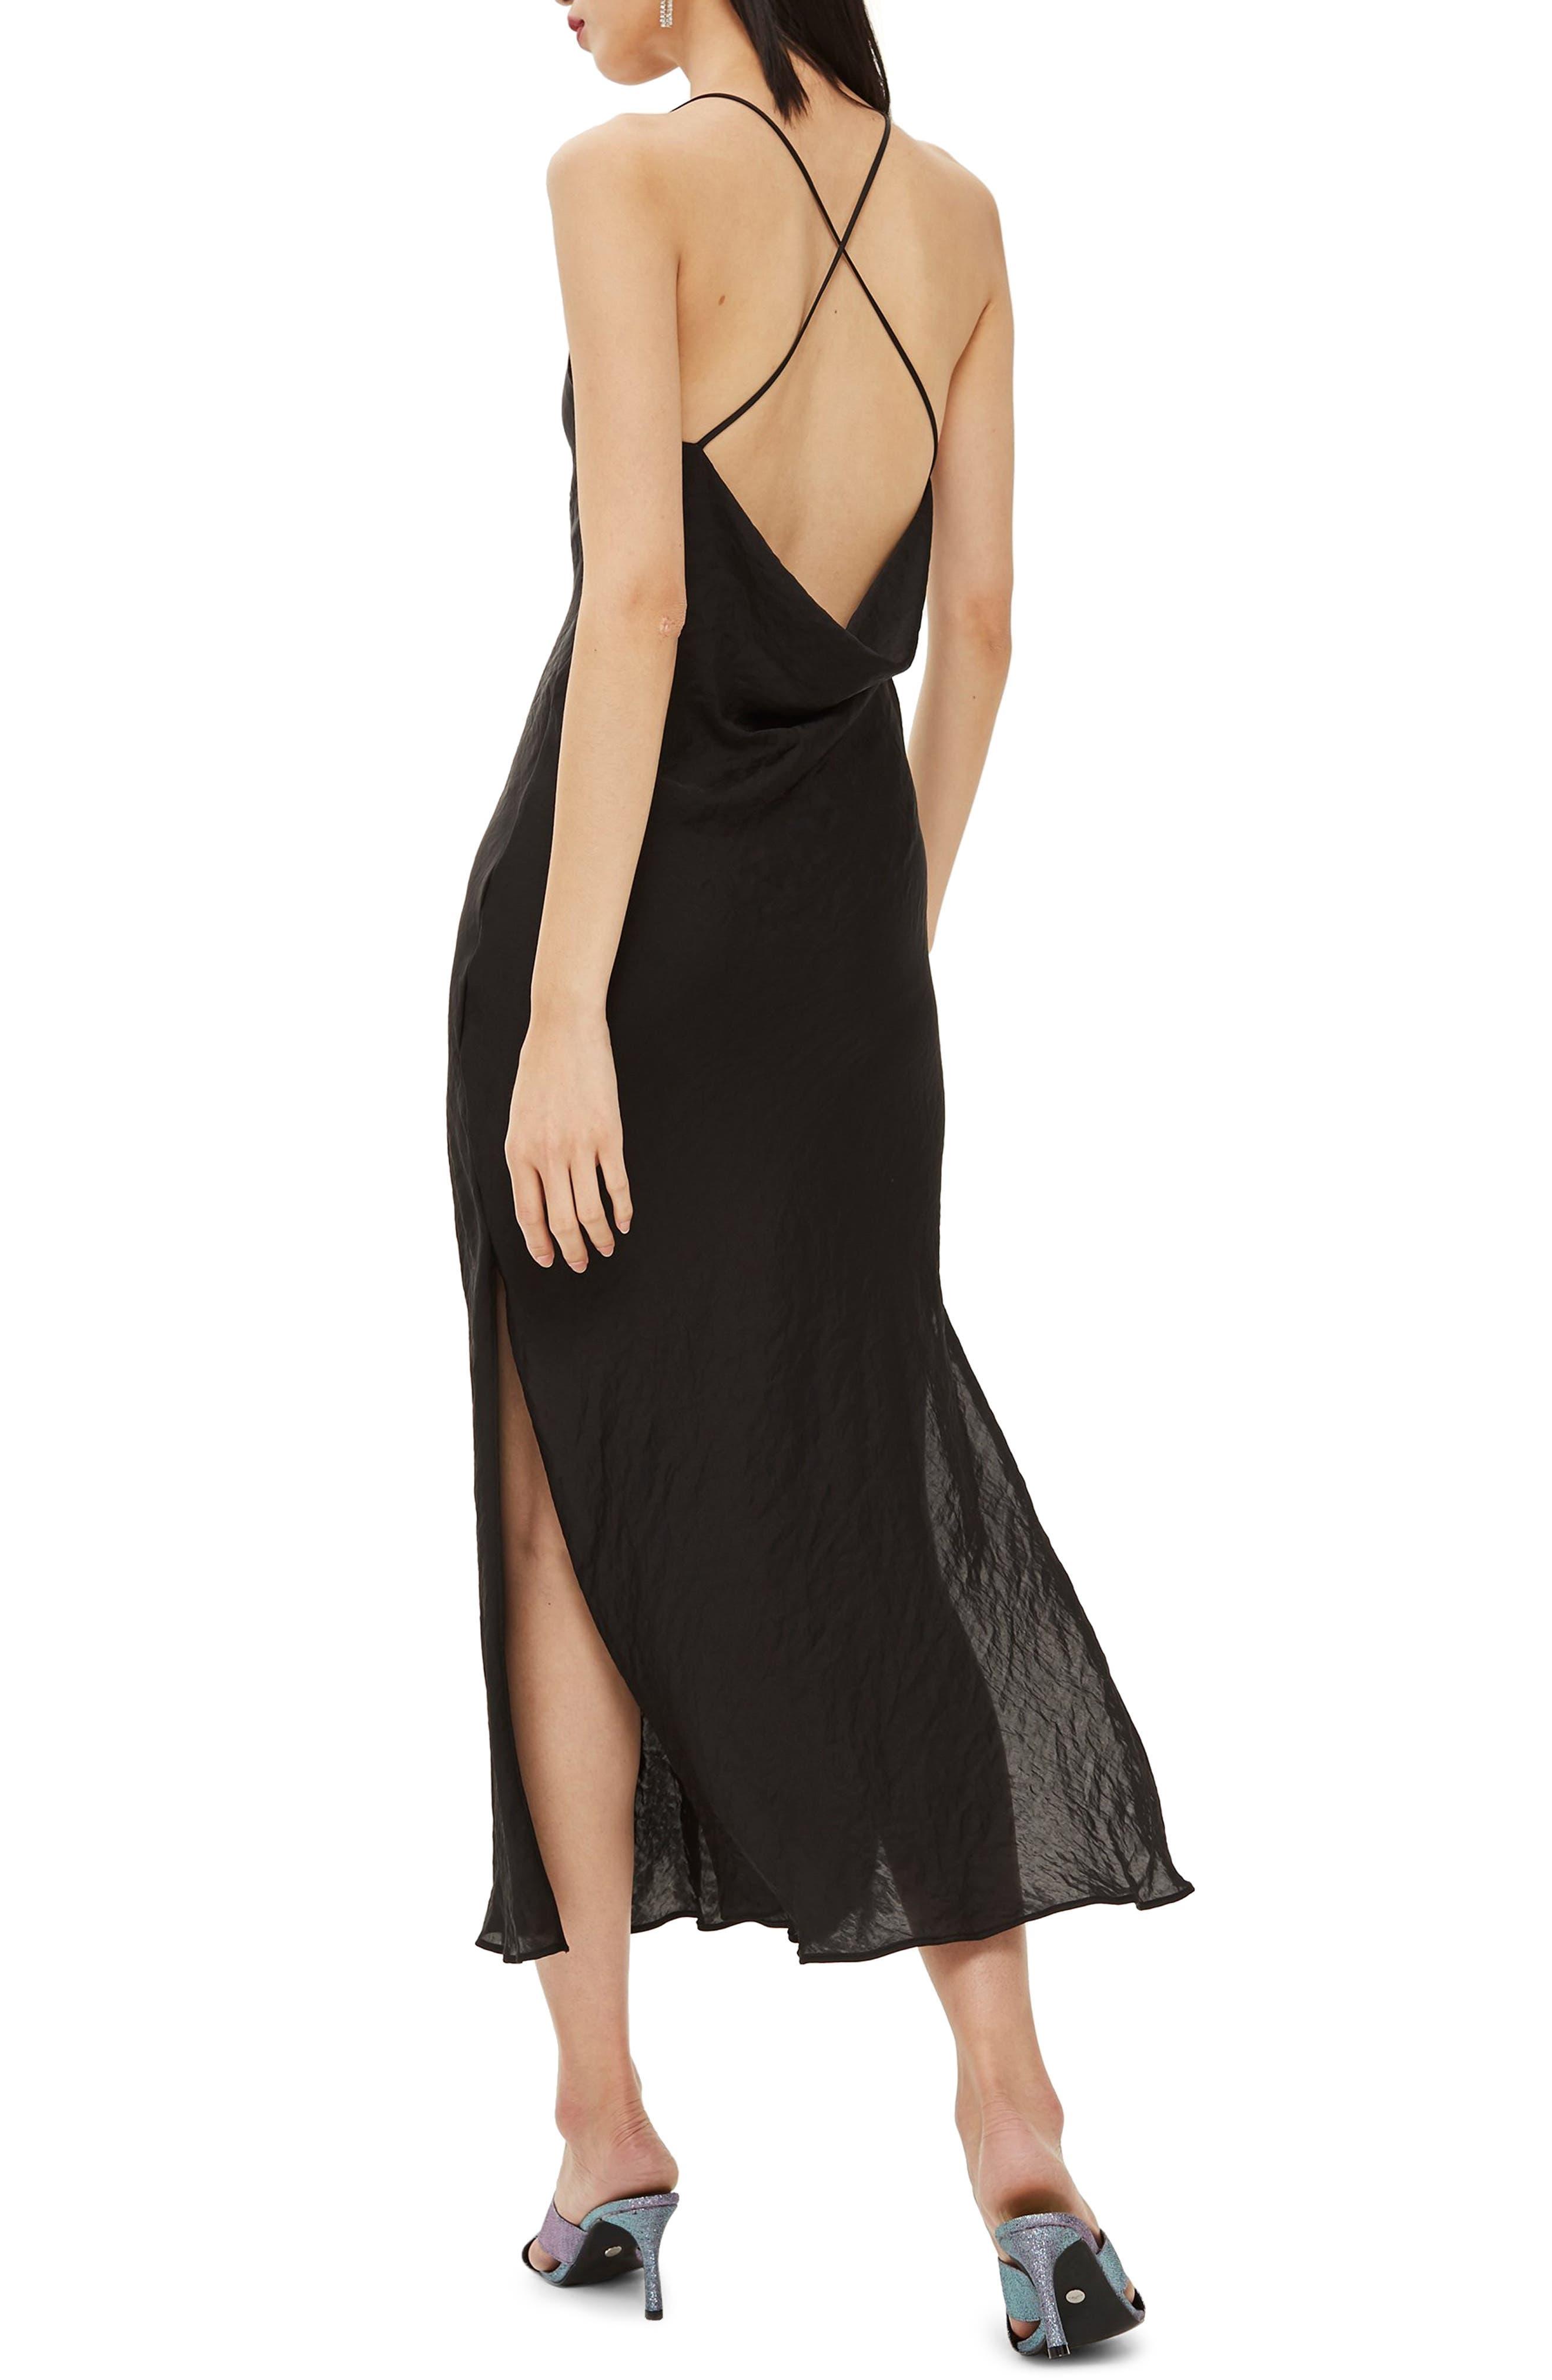 8ce7787d2511 Women's Dresses Topshop Clothing | Nordstrom